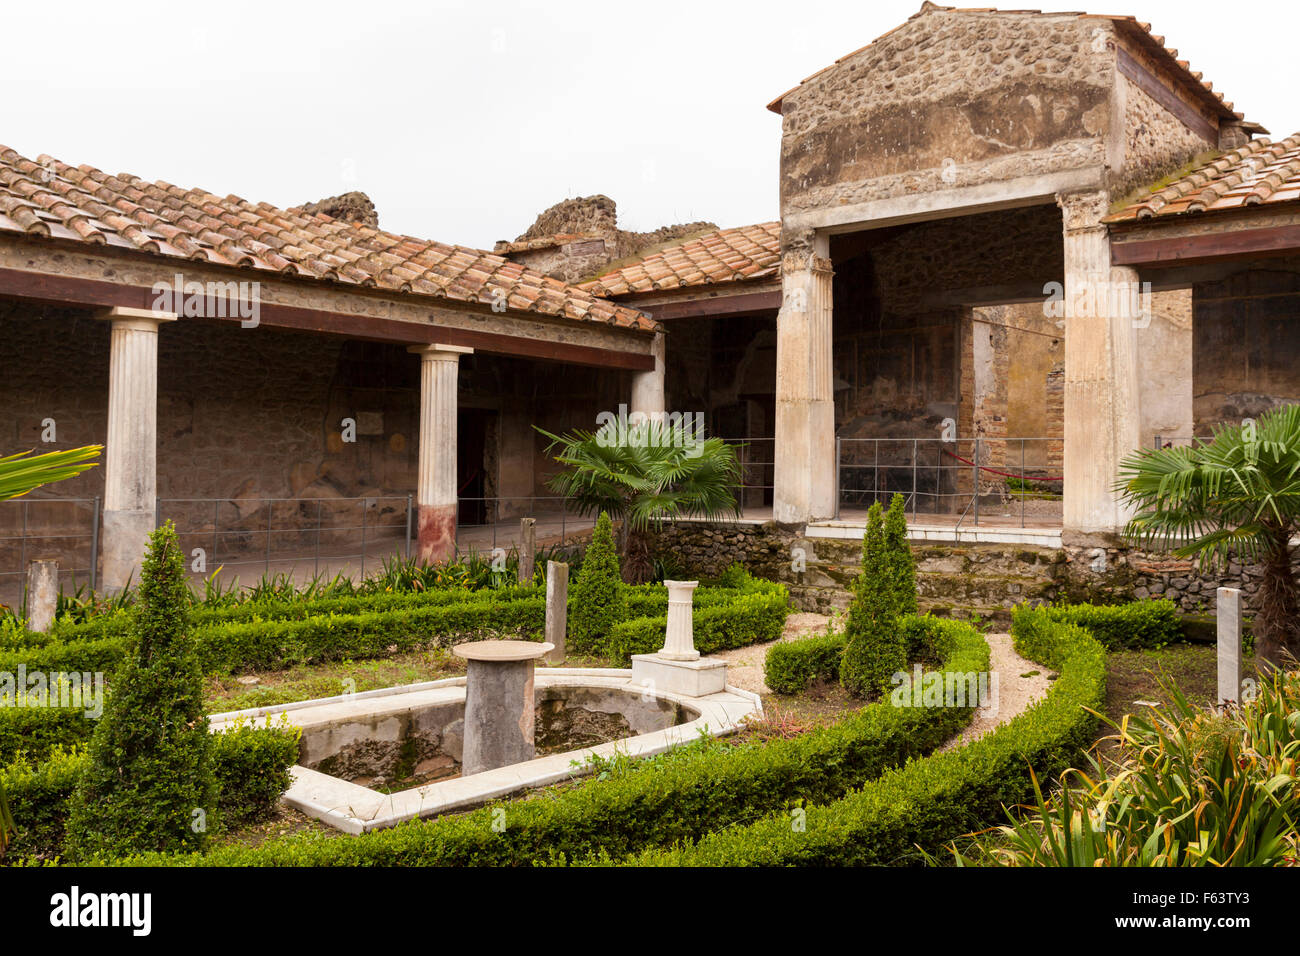 Casa Degli Amorini Dorati, House of the Gilded Cupids, atrium of the restored villa at the excavation site of Pompeii, Italy Stock Photo